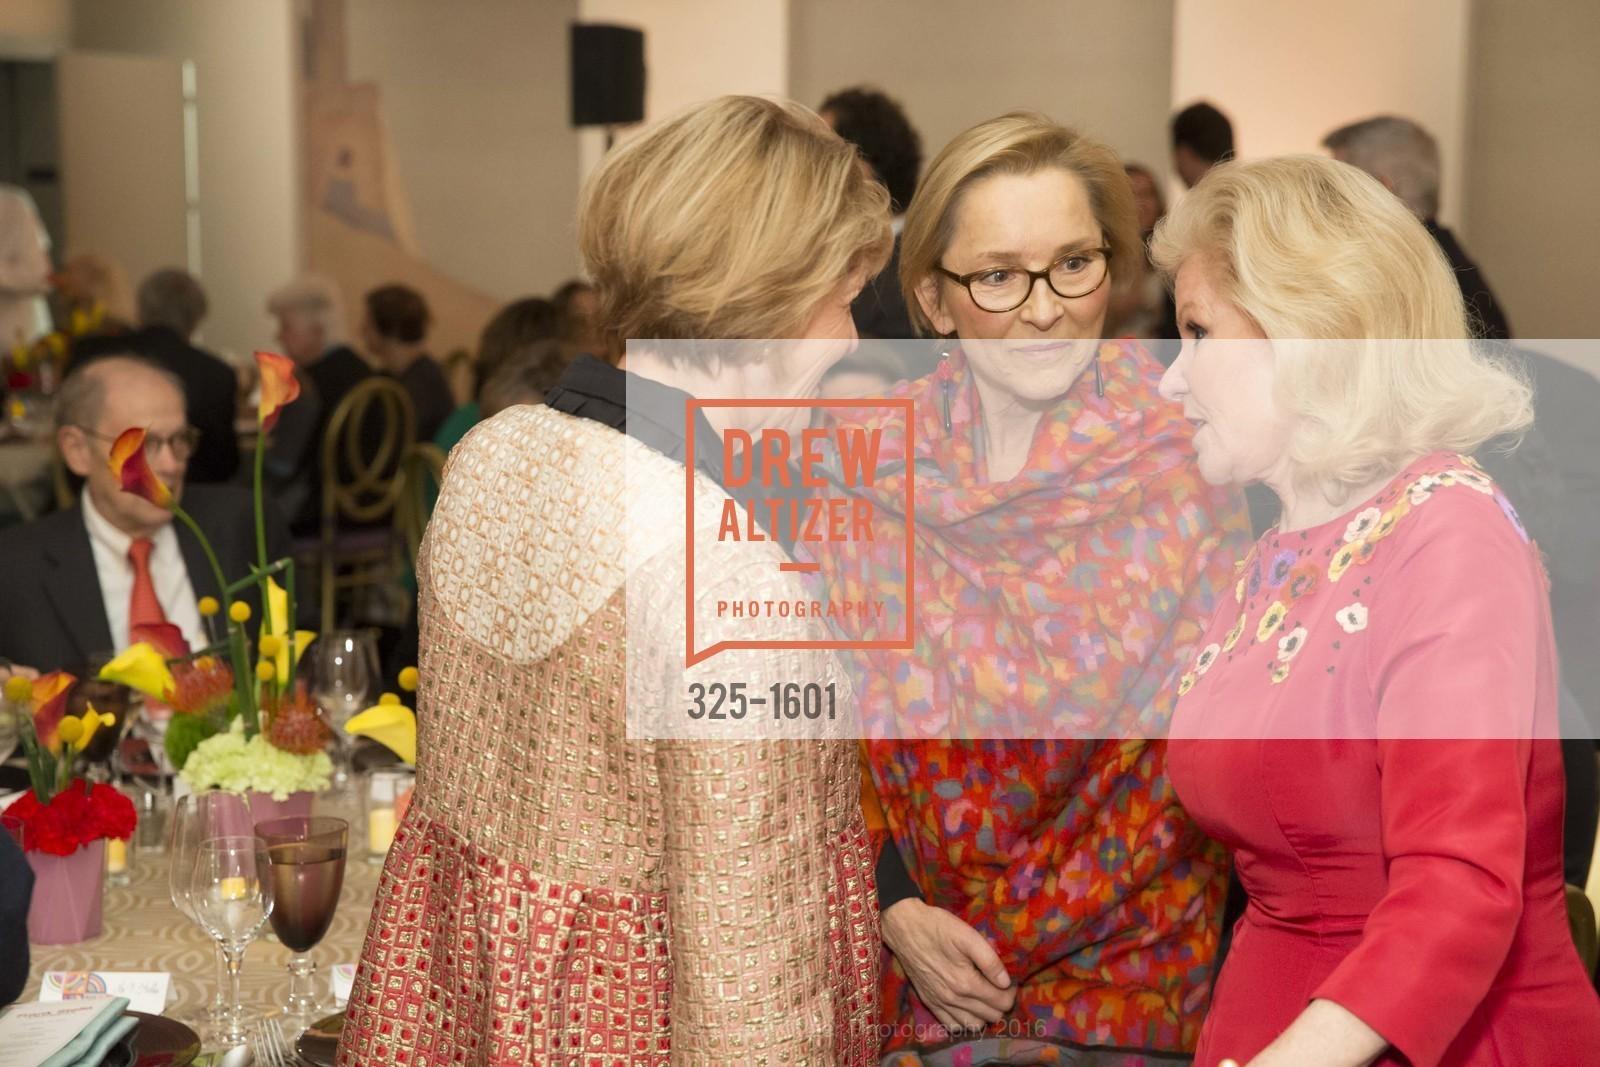 Dagmar Dolby, Ursula Hess, Dede Wilsey, Photo #325-1601